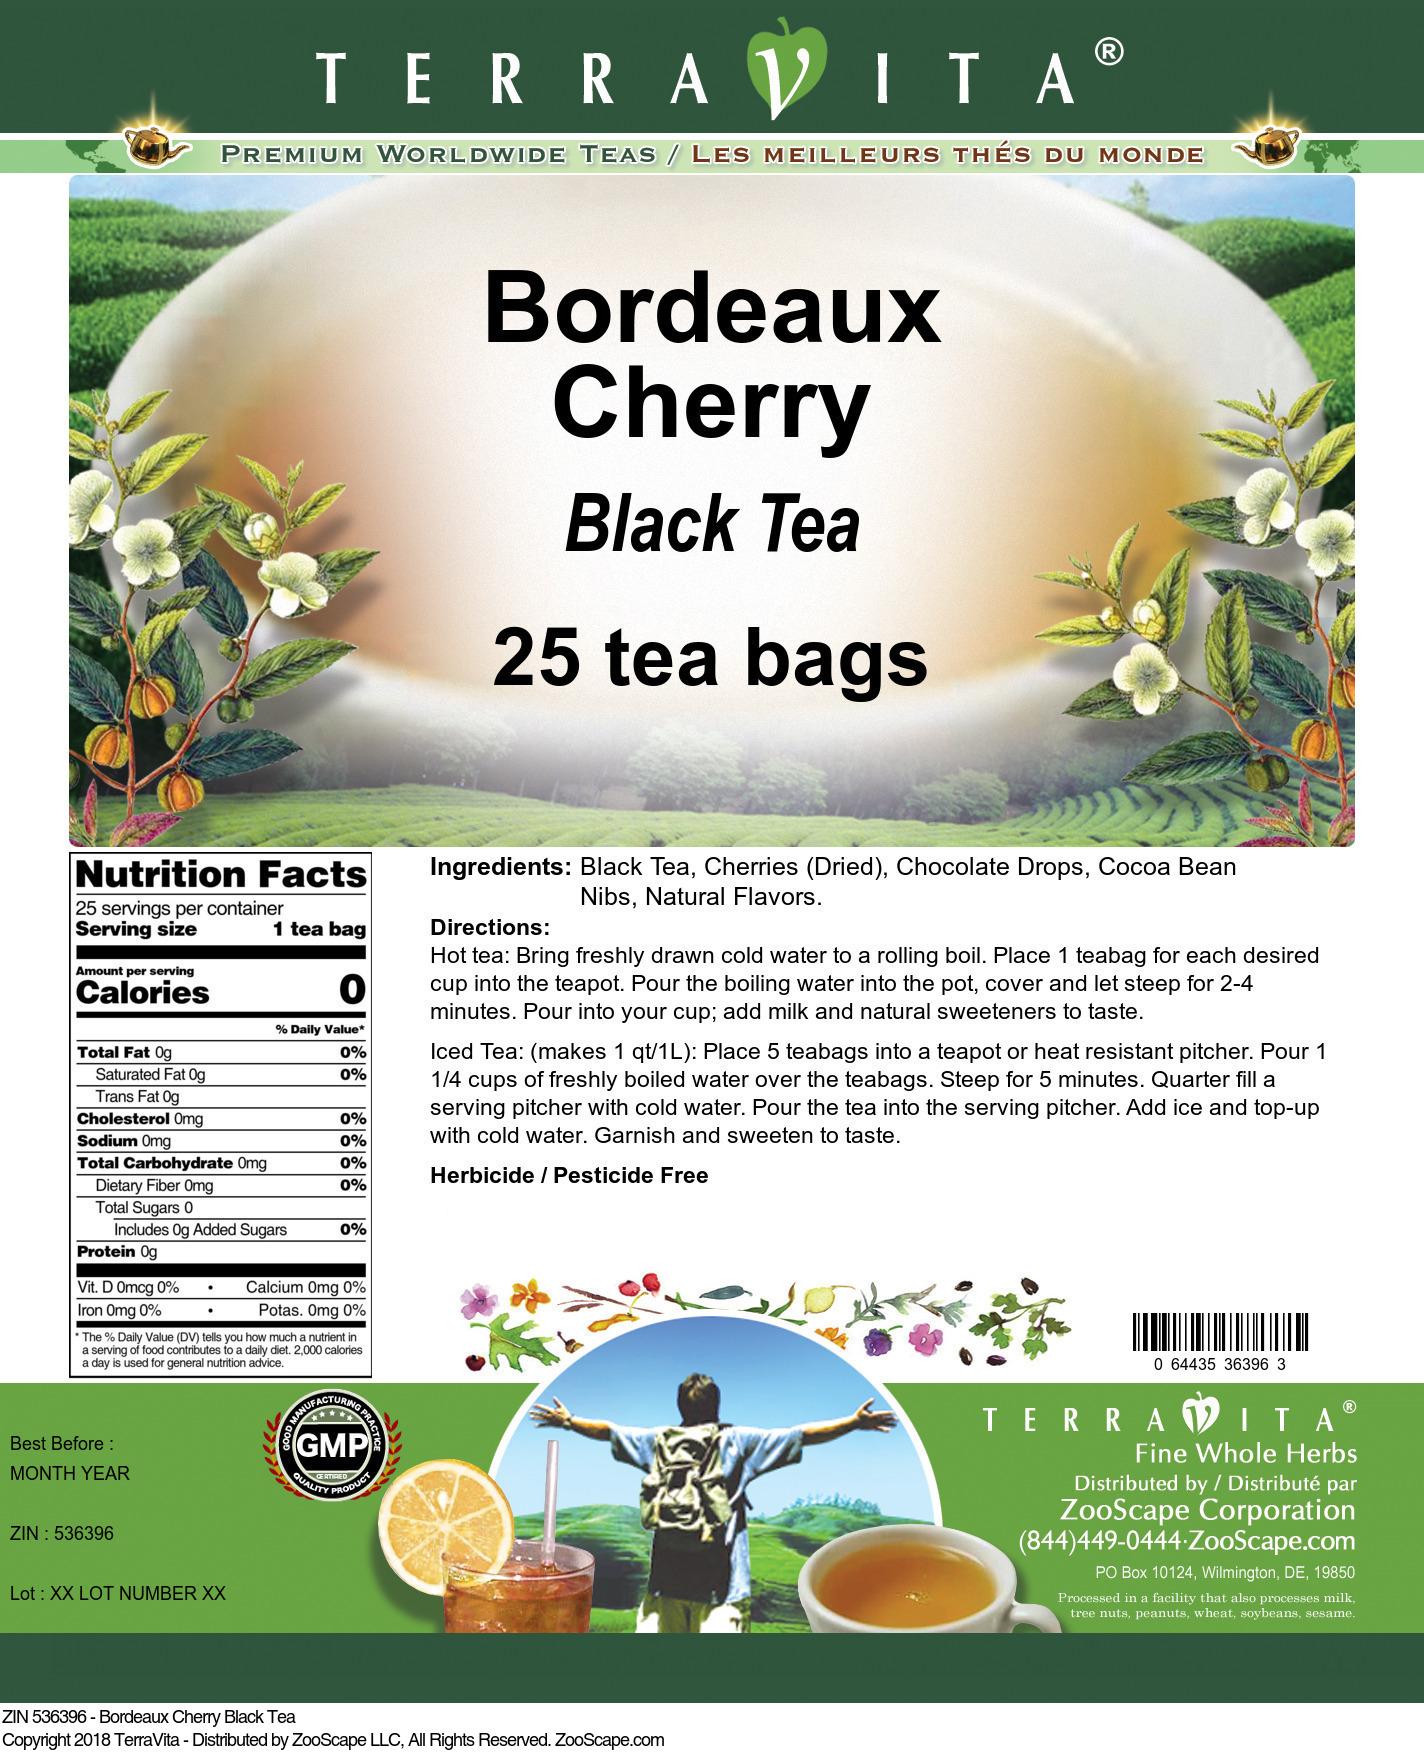 Bordeaux Cherry Black Tea